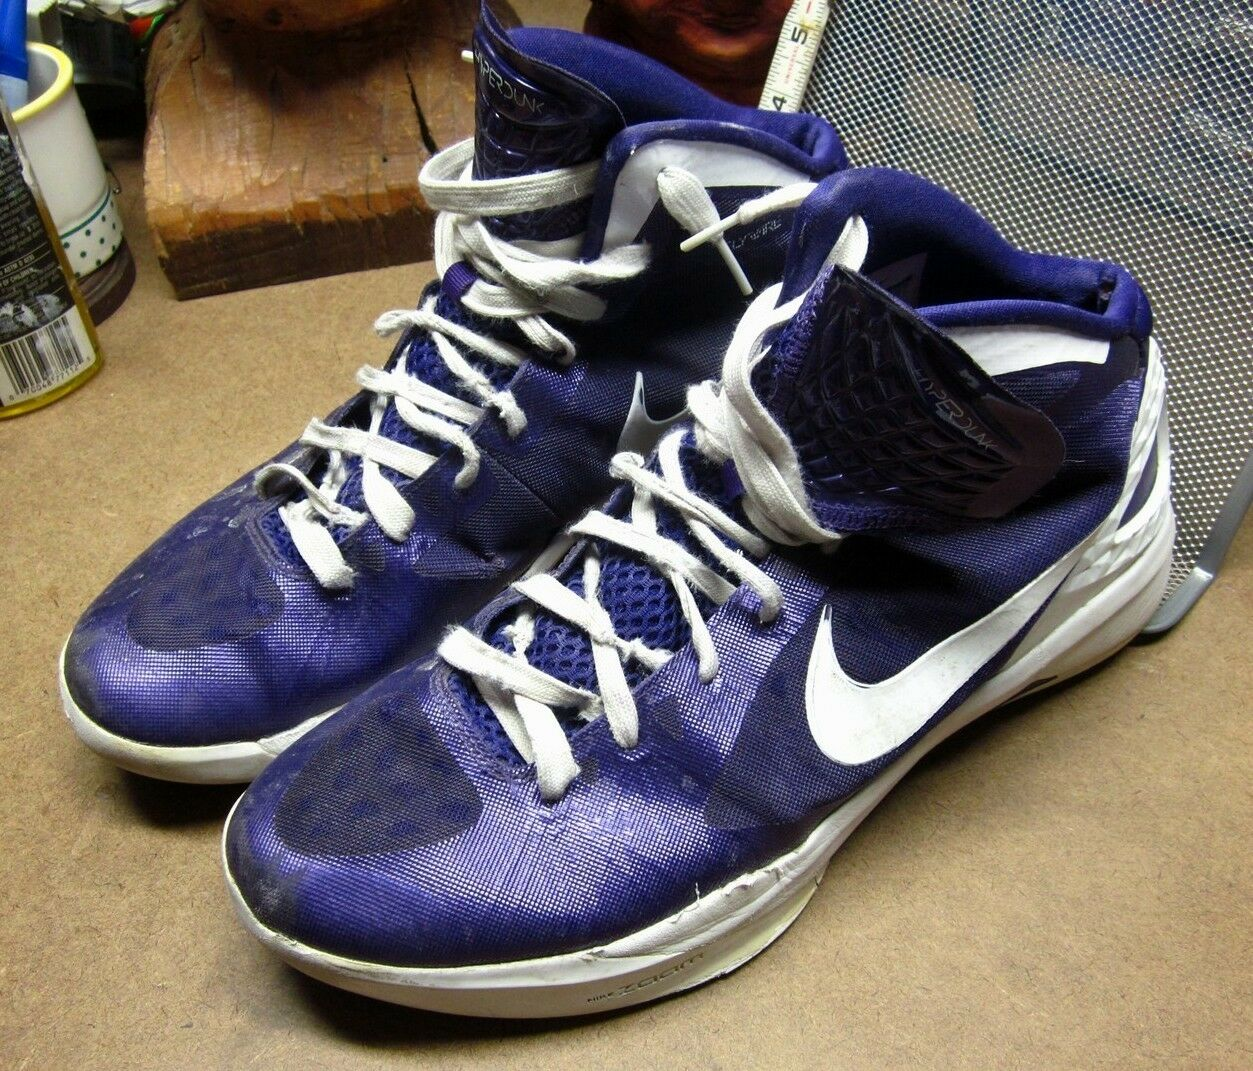 NIKE HYPERDUNK chaussures Violet Zoom tennis  chaussures HYPERDUNK  2018 Taille 12½ basketball Blake Griffin c6c93b